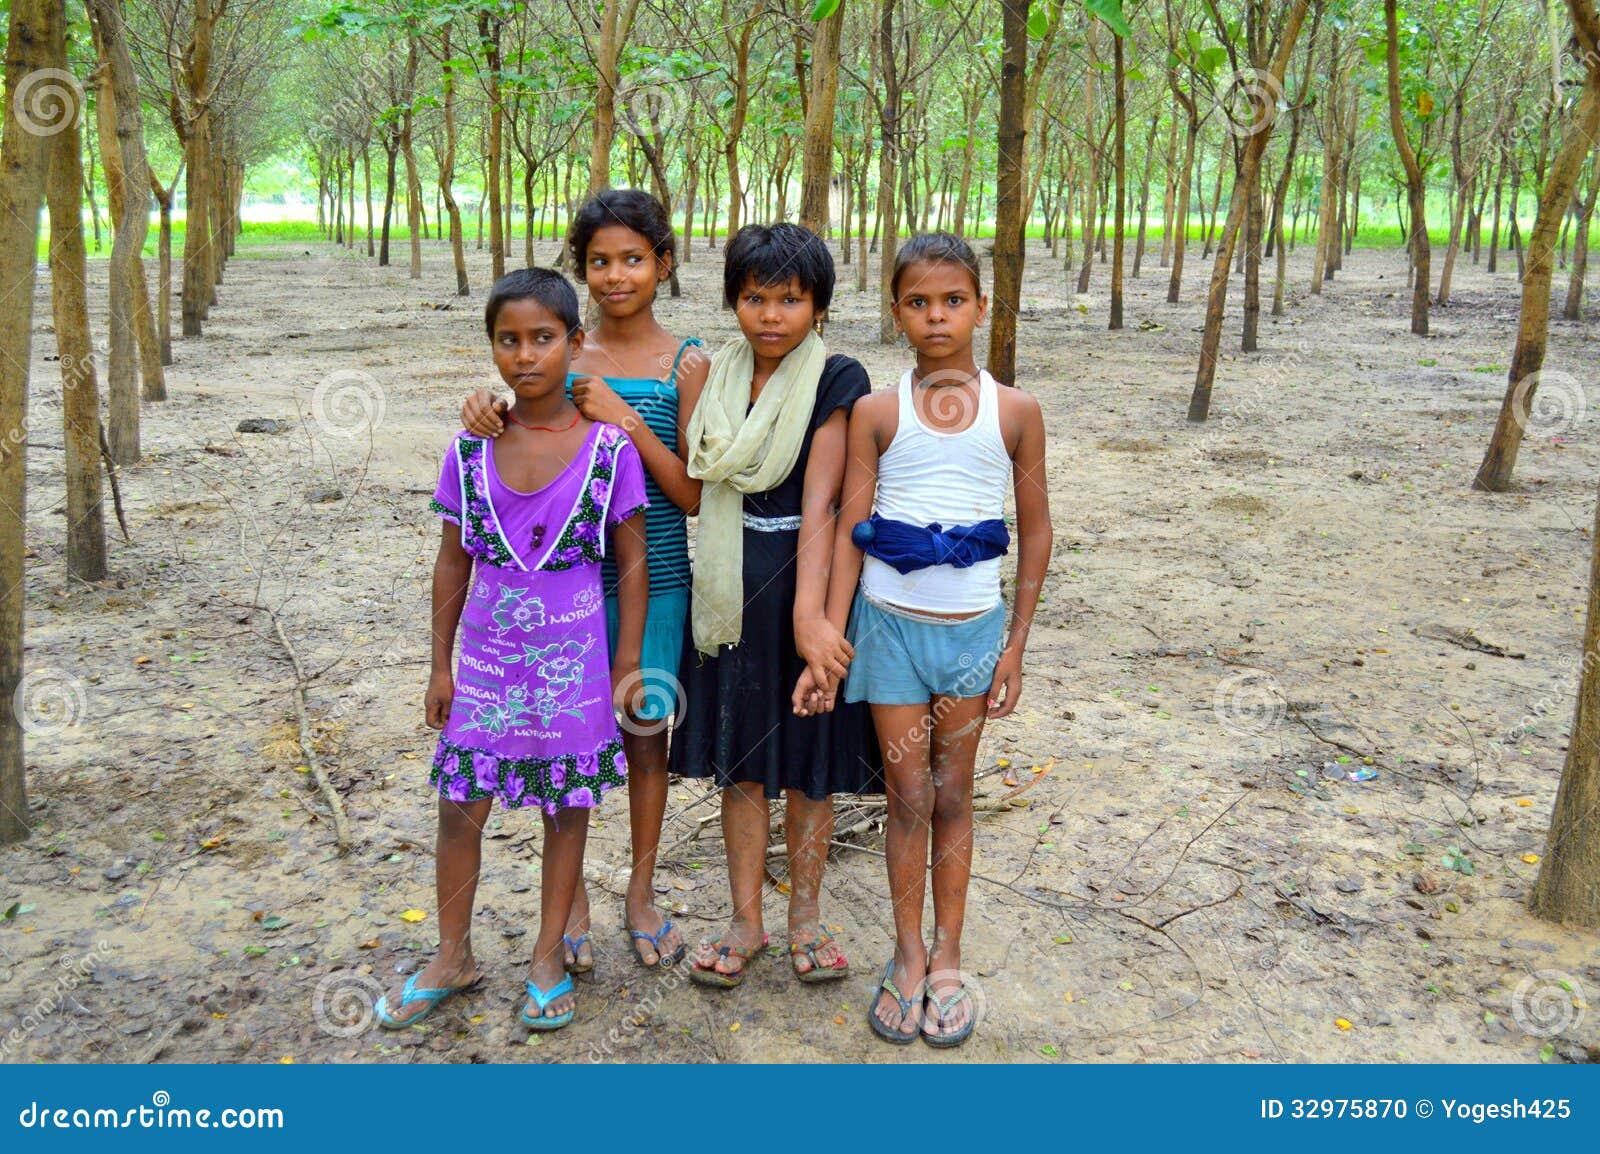 Indian Village Girls Editorial Image Image Of Beautiful - 32975870-4809